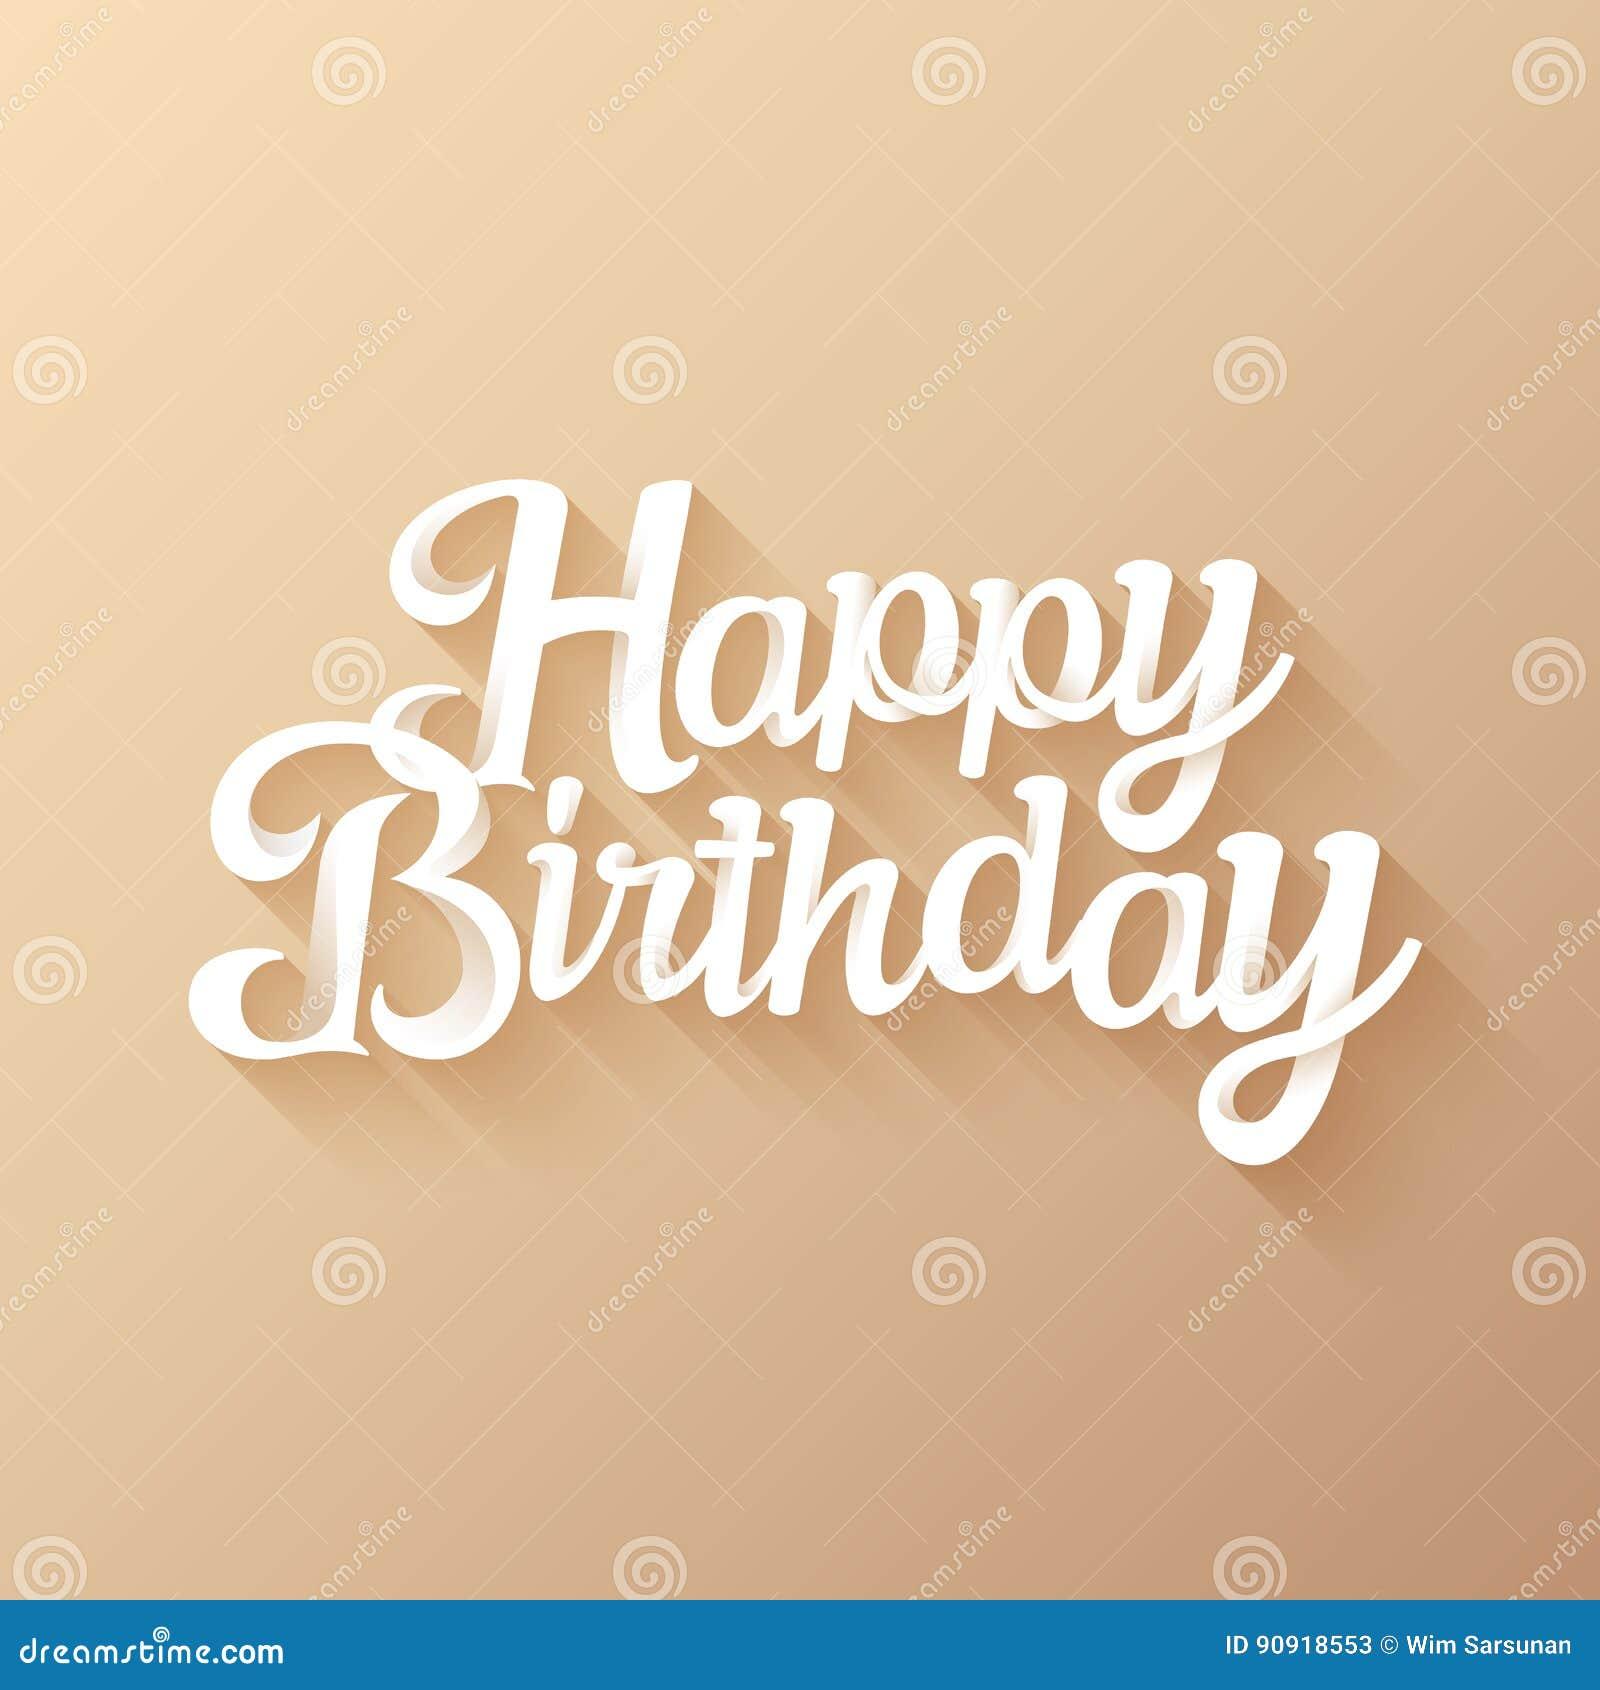 Happy Birthday beautiful 3d lettering design